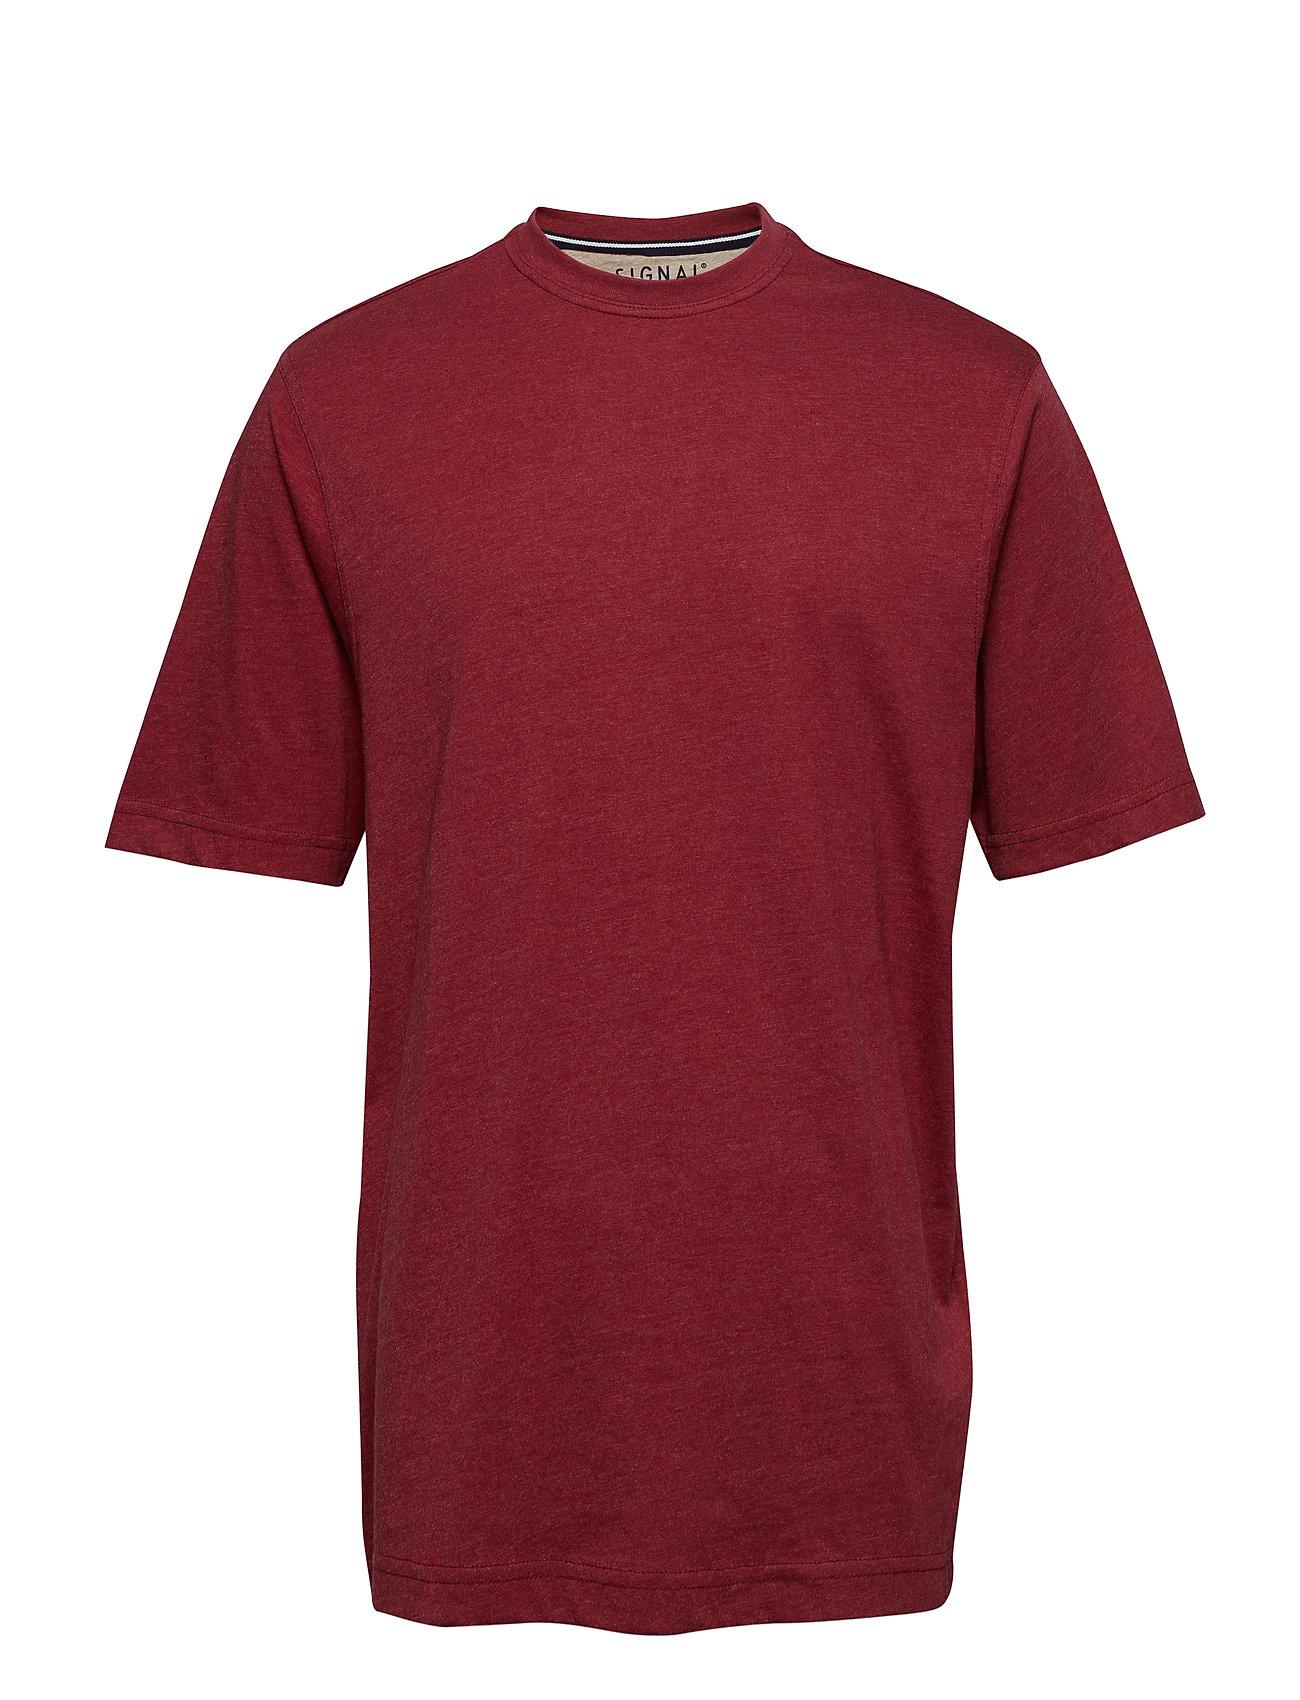 Signal T-shirt/Top - RED SAIL MELANGE